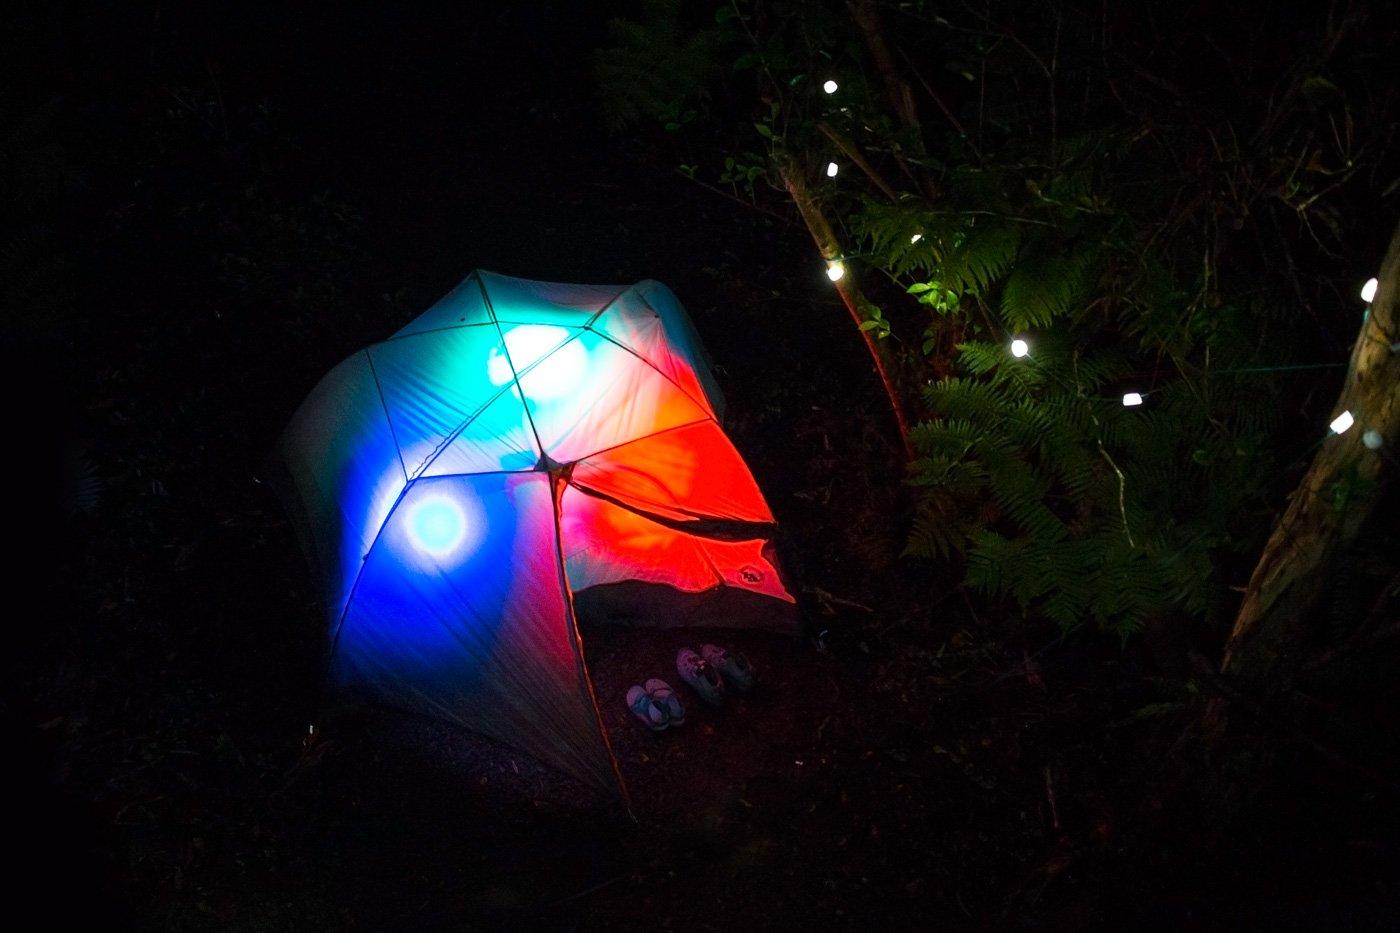 BioLite Sunlight Solar Powered Lantern, Grey by BioLite (Image #9)